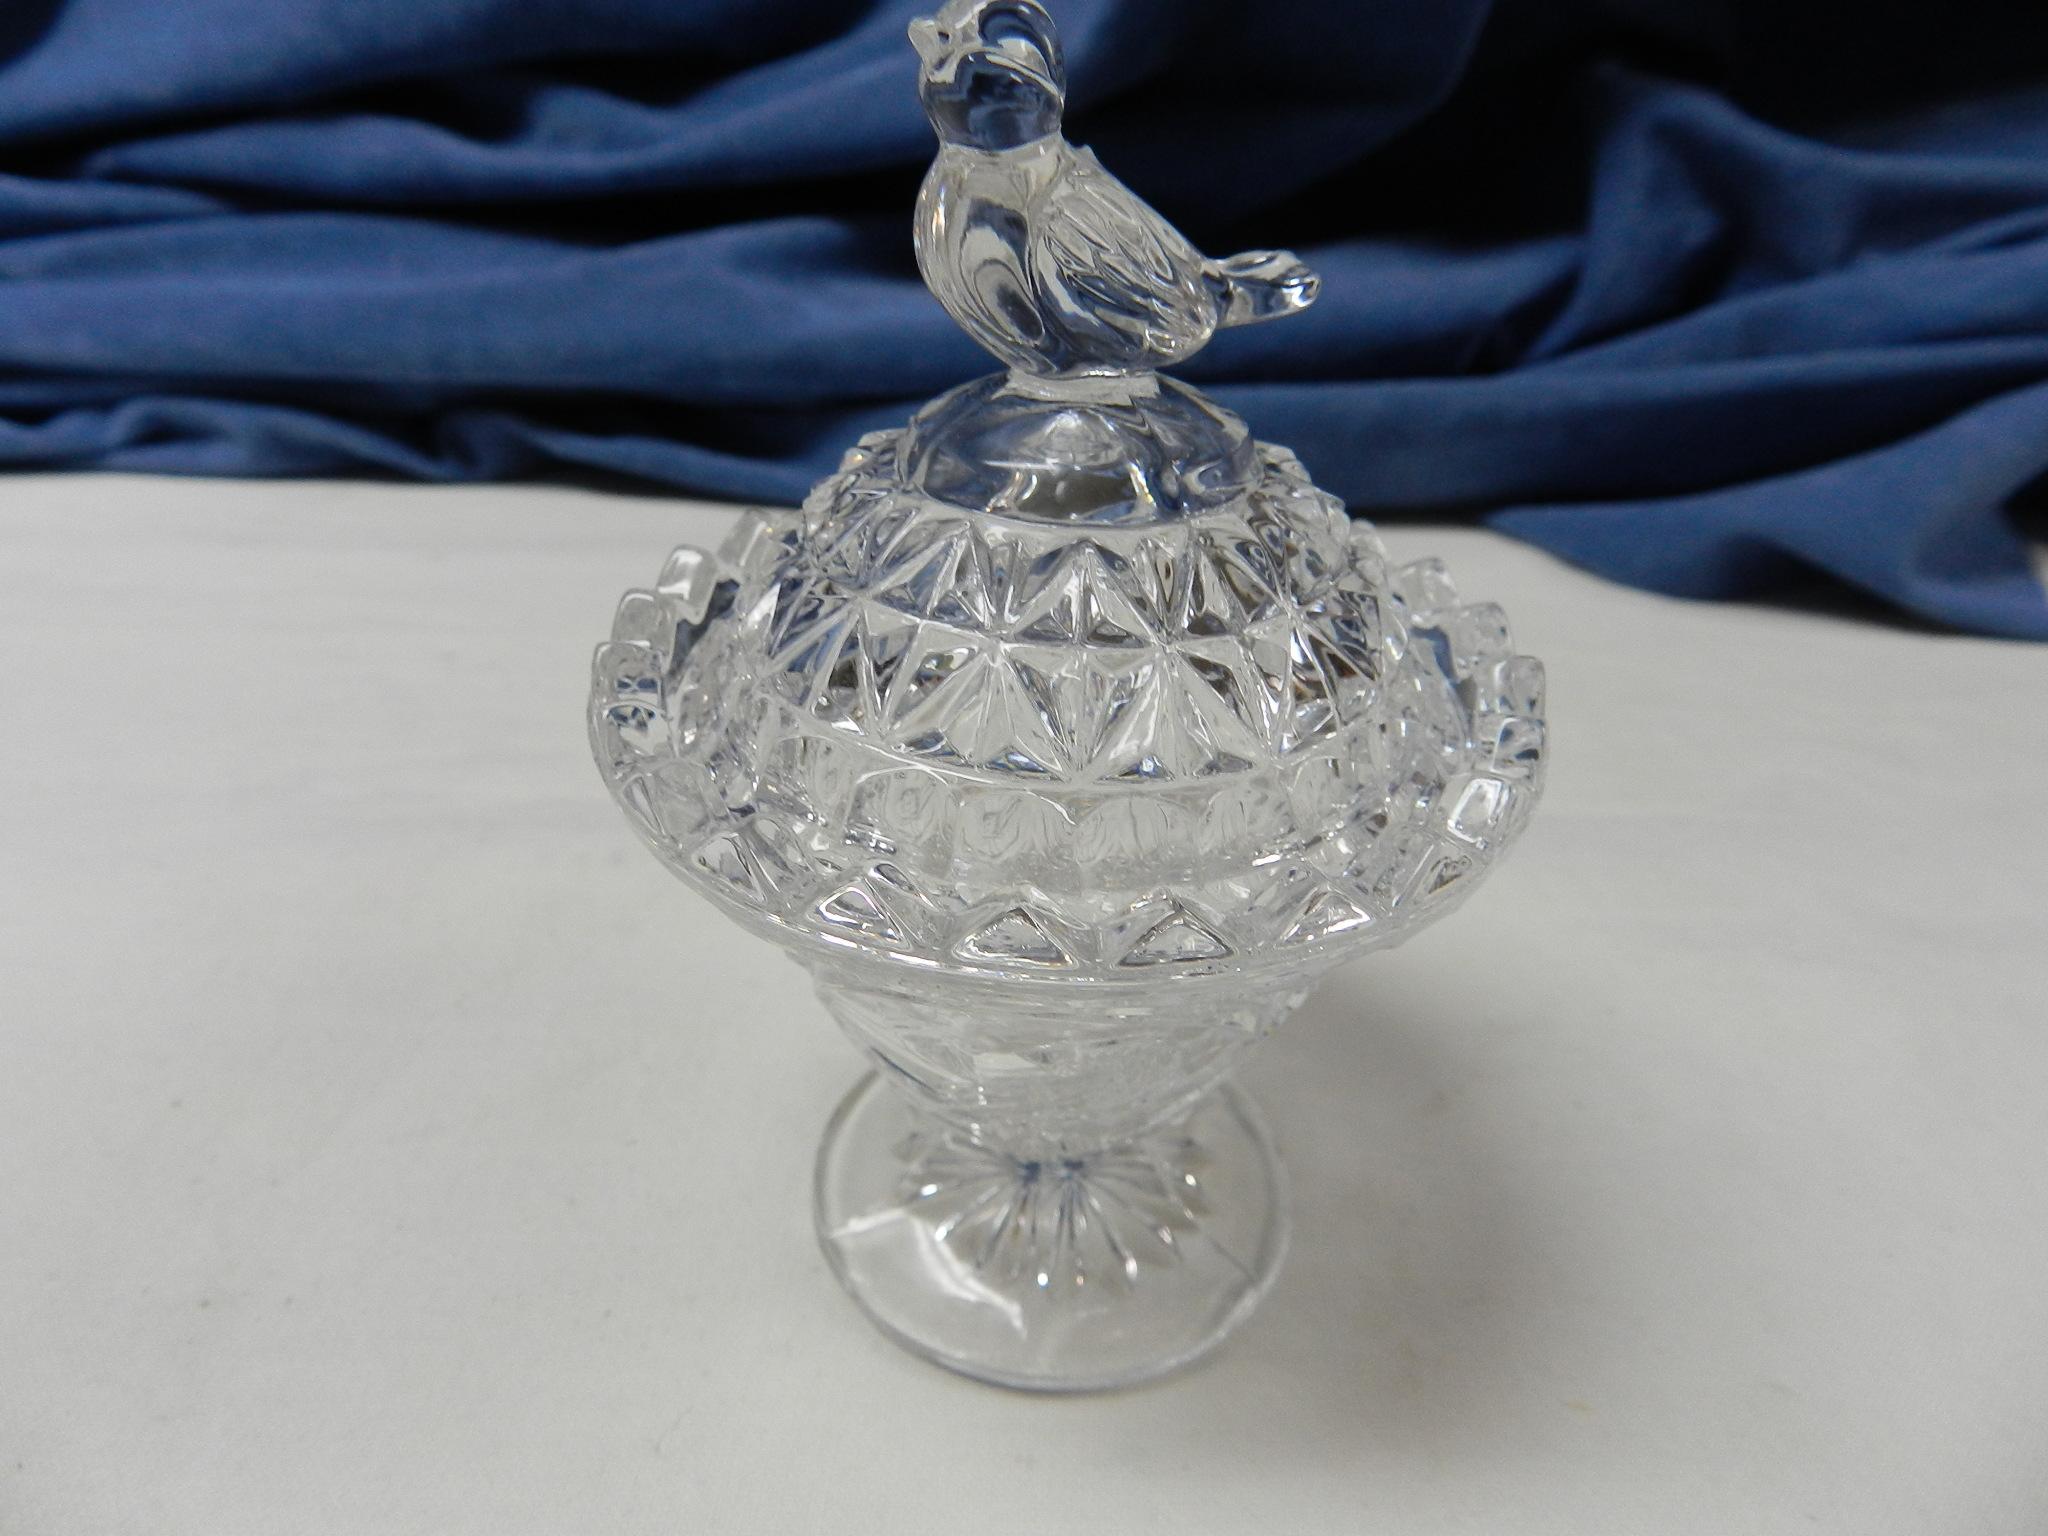 $49 - Hofbauer Trinket Box and Pinwheel Crystal Items